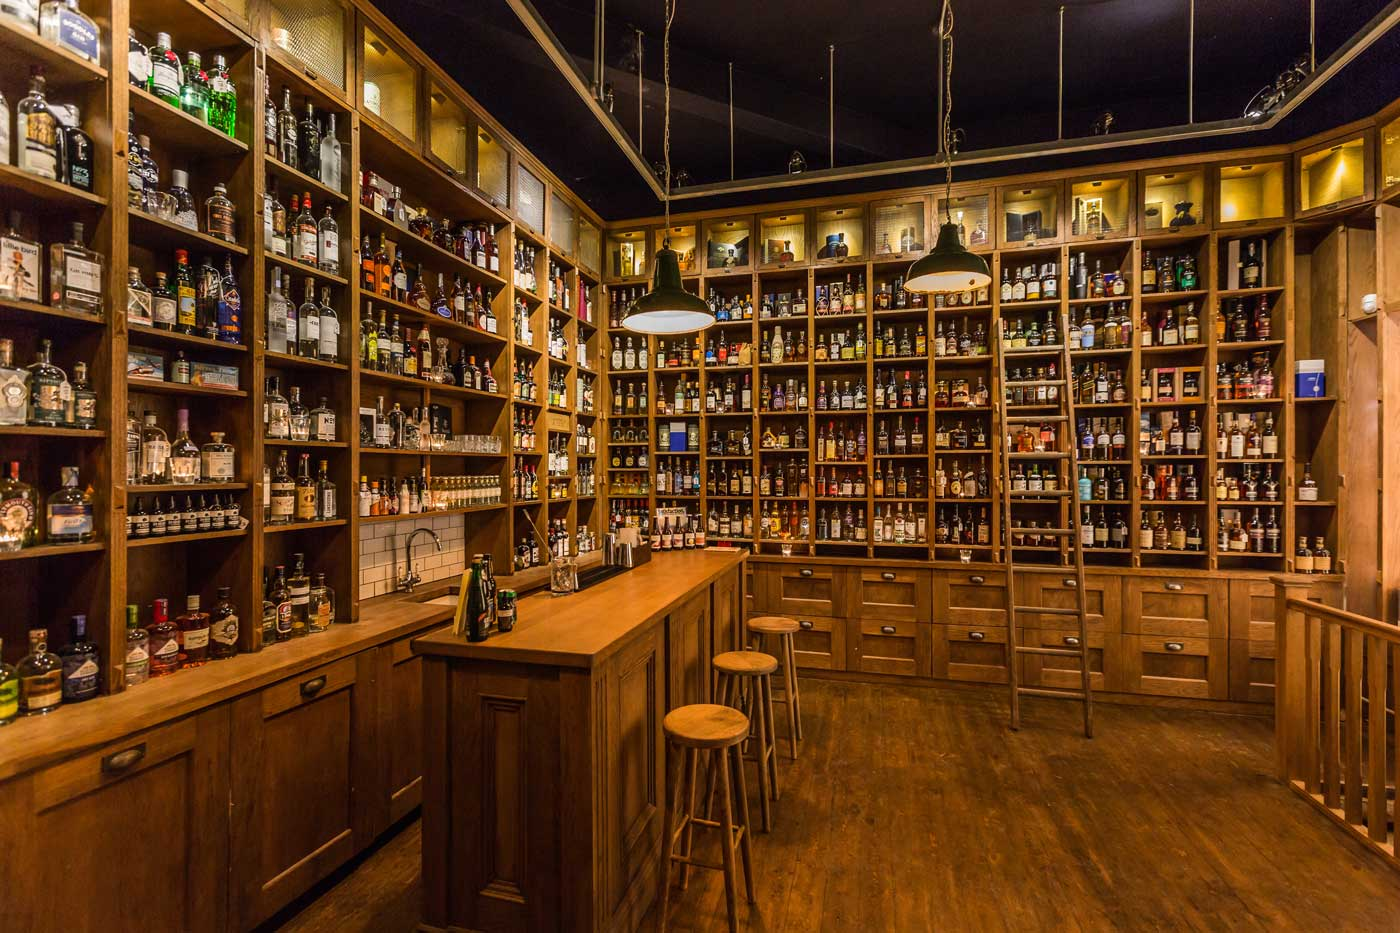 tt-liquor-gin-tasting-cocktail-making-classes-shoreditch-east-london-